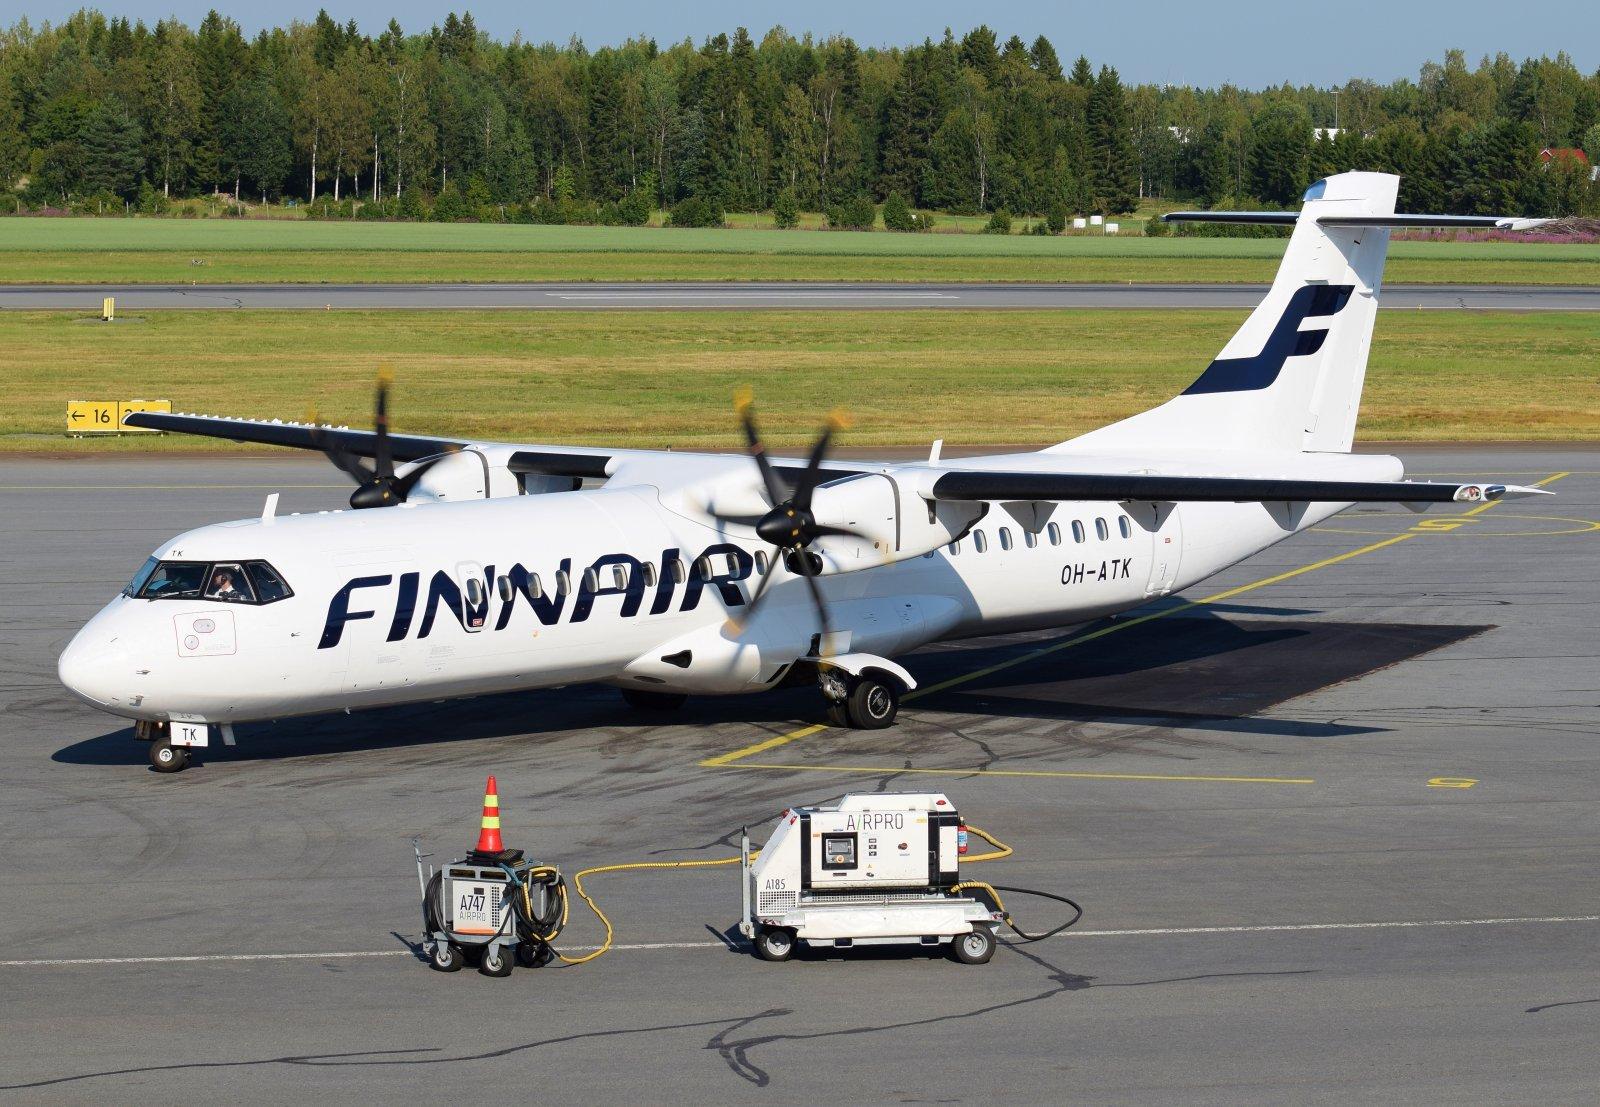 OH-ATK - ATR 72-500 - Finnair - 27.7.2019